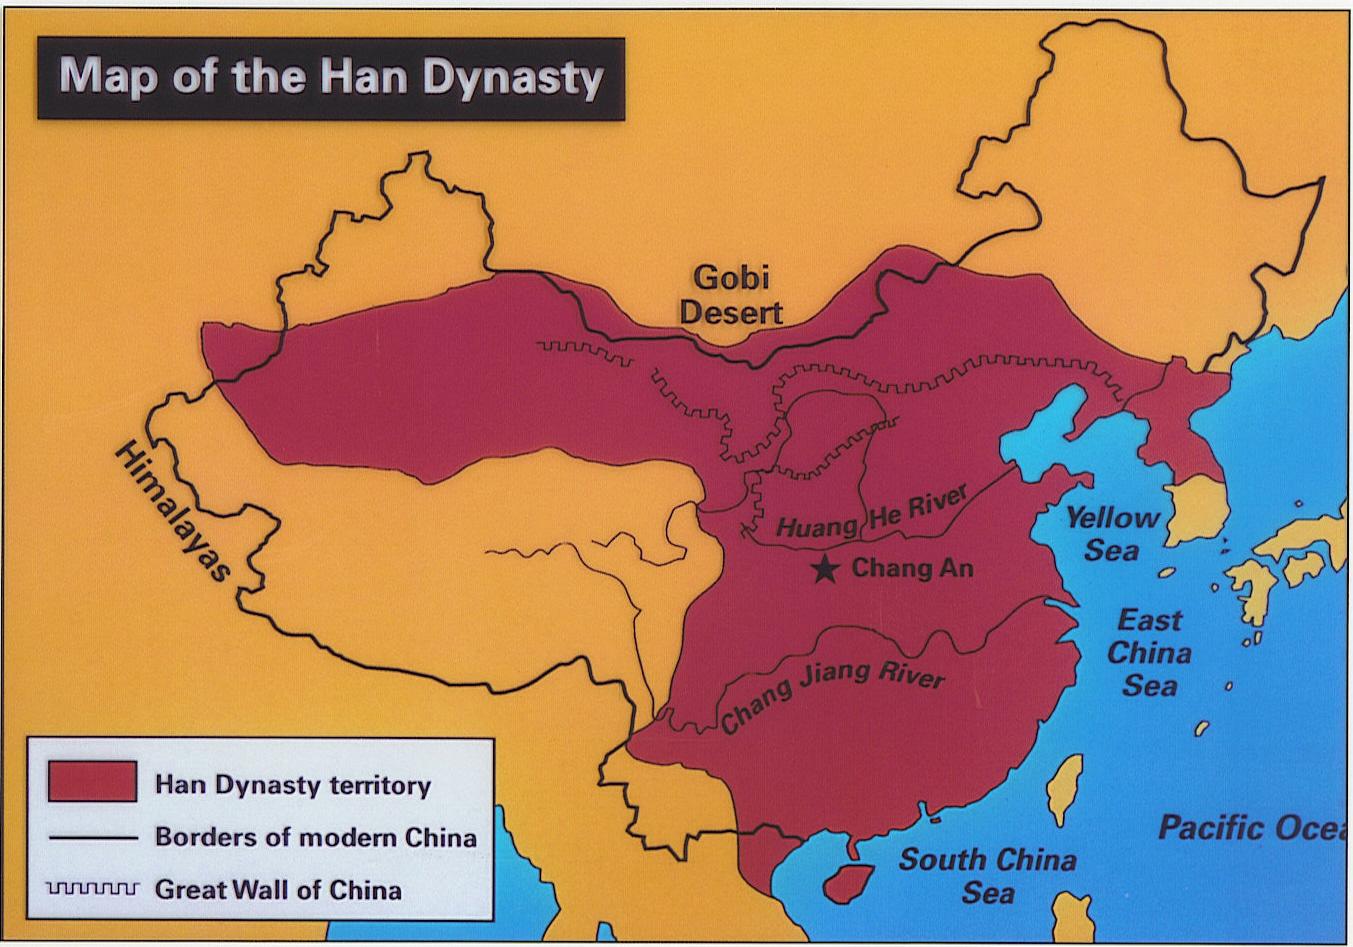 The Han Dynasty [206 BC – 220 AD]